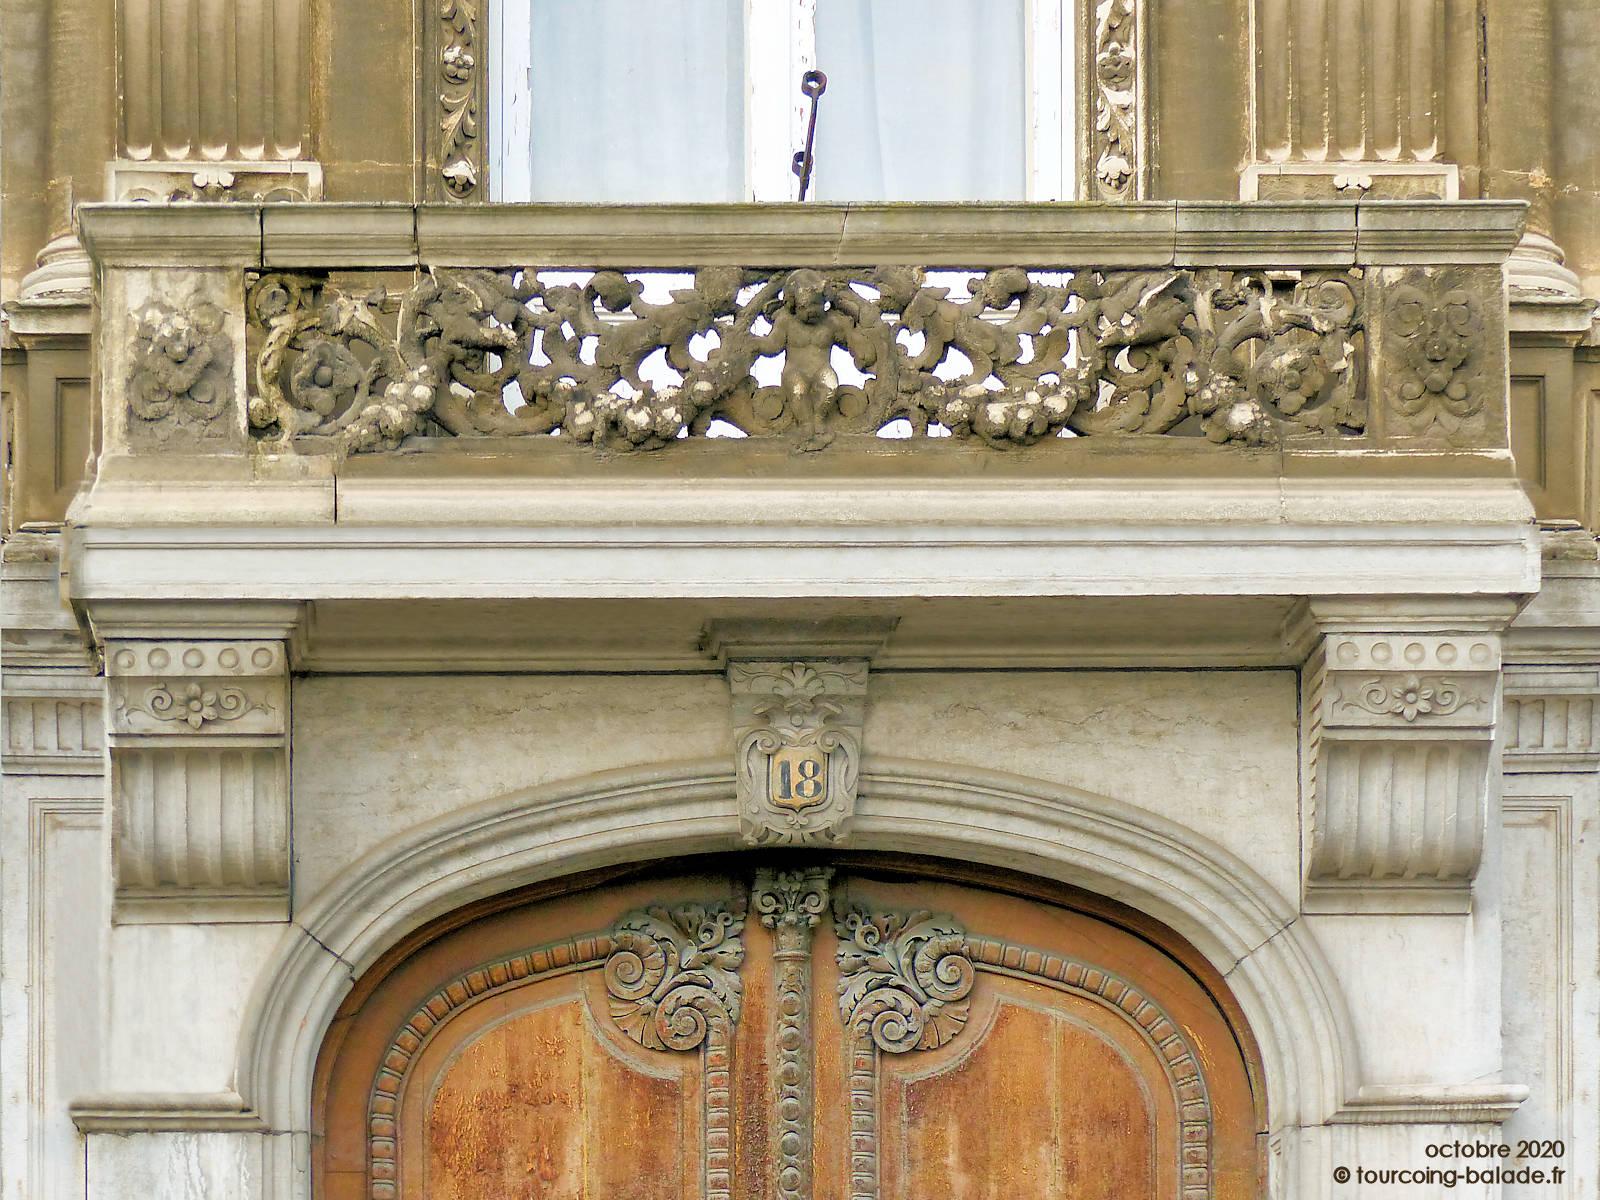 Balcon du Monastère des Bénédictines, Tourcoing 2020